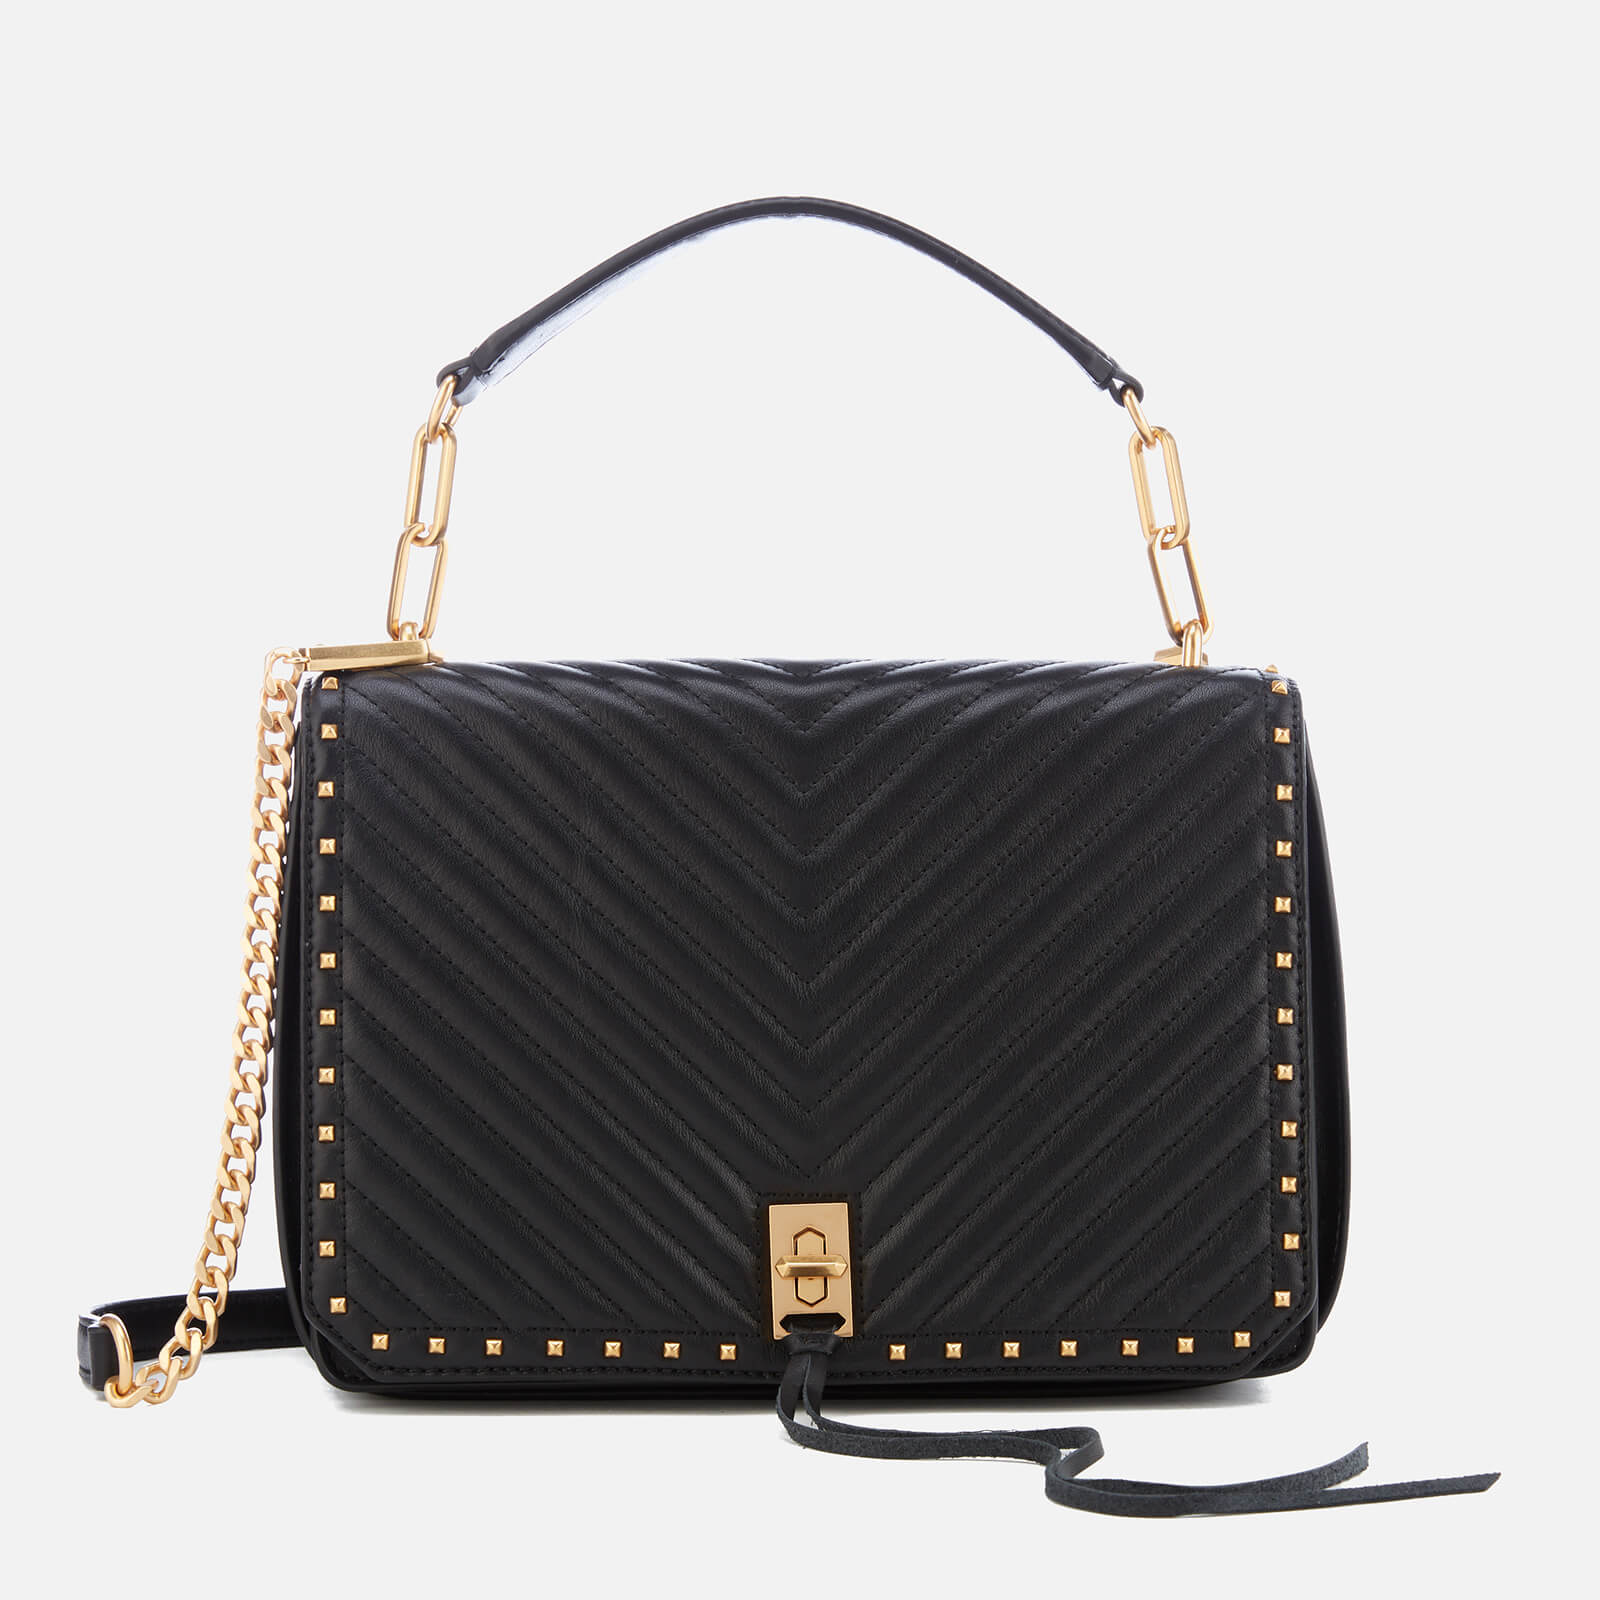 4a63d99548 Rebecca Minkoff Women s Medium Becky Shoulder Bag - Black - Free UK ...